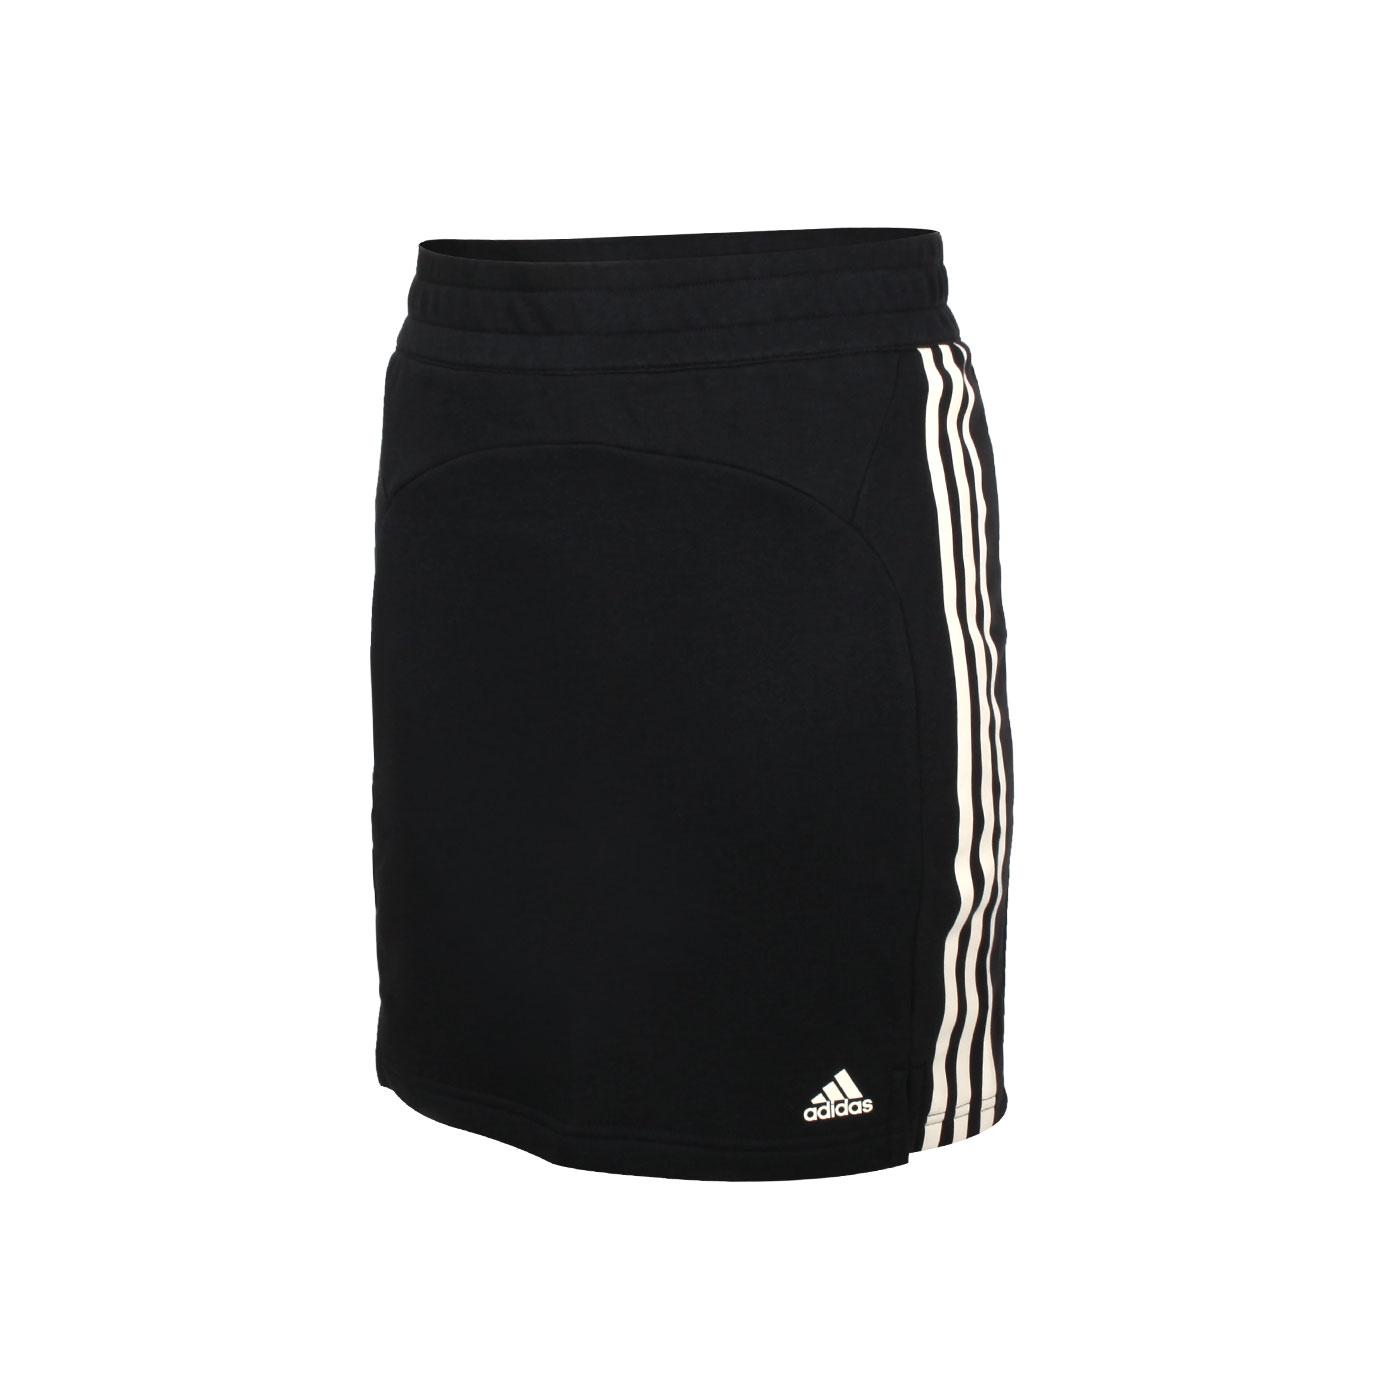 ADIDAS 女款短裙 GL3905 - 黑米白